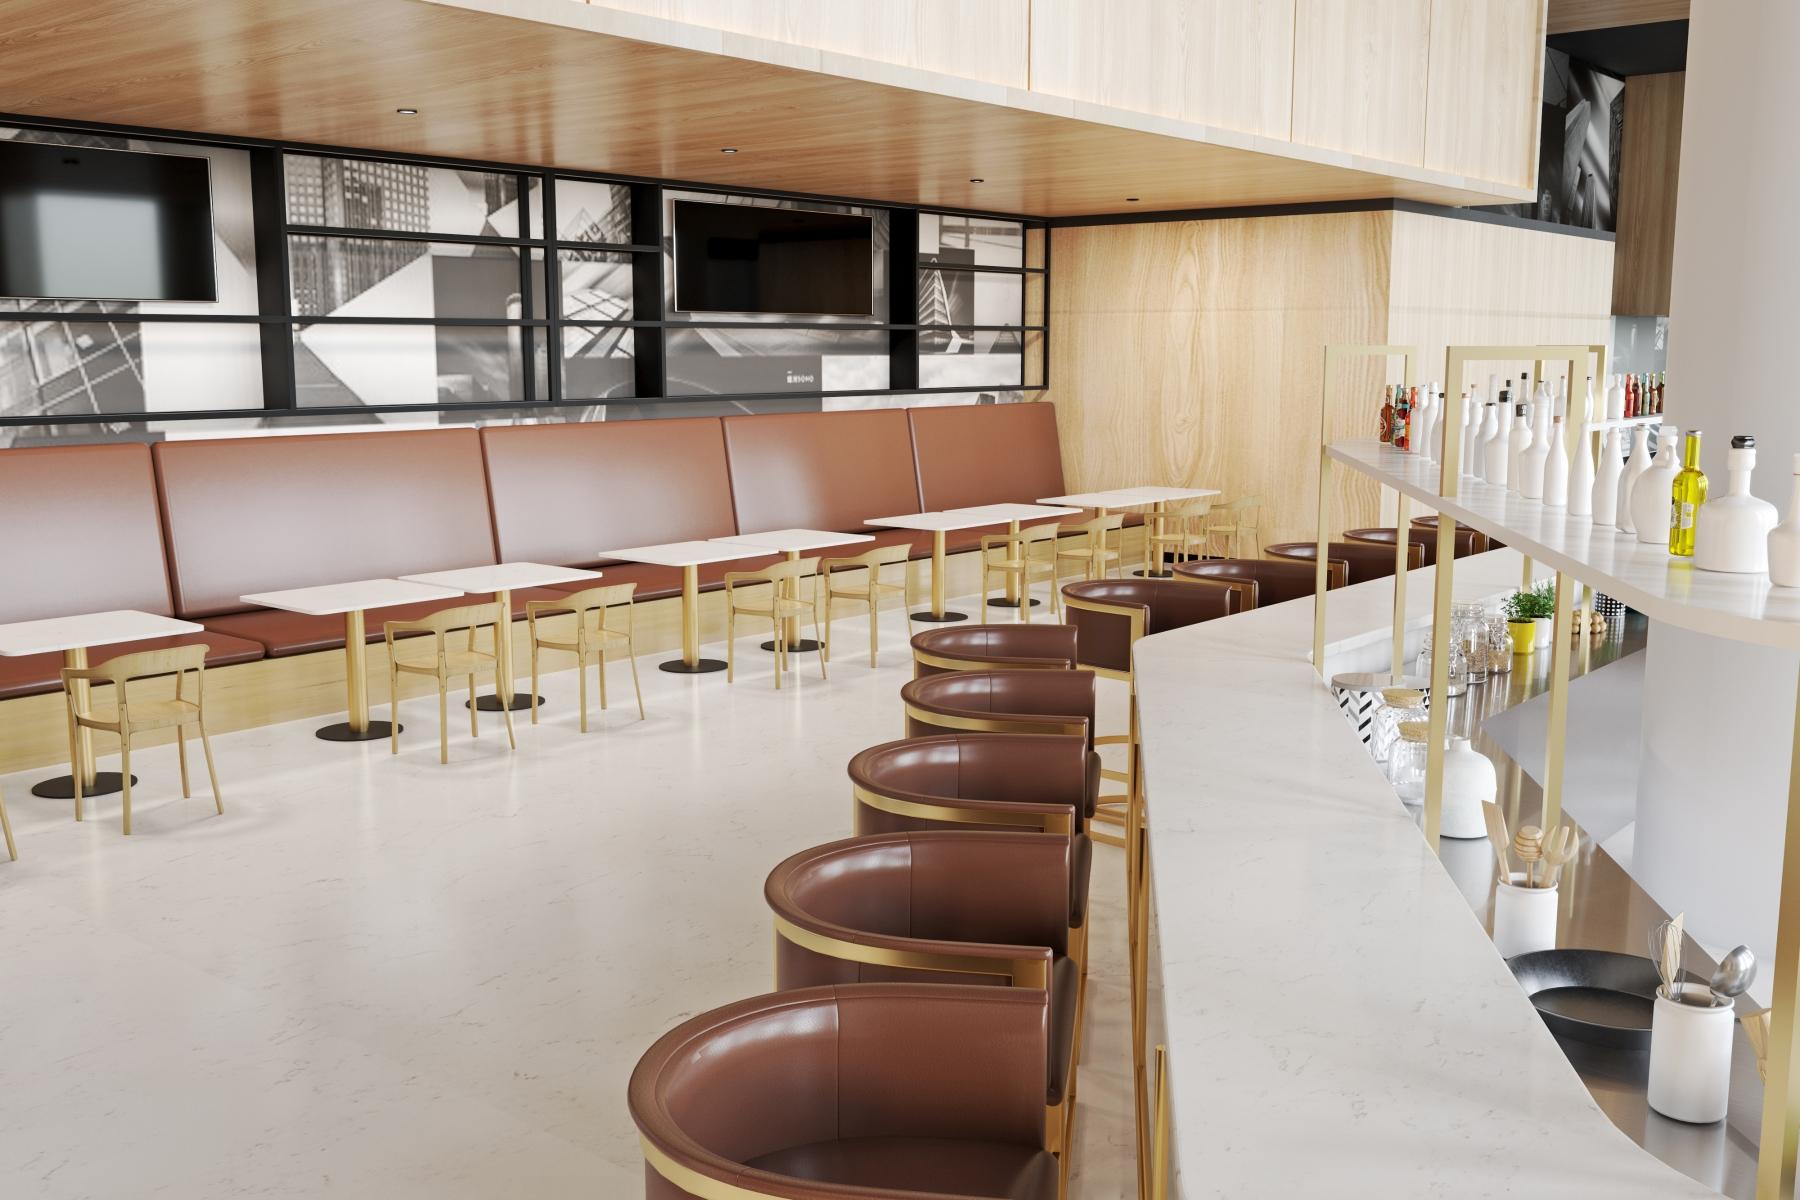 V1075 Restaurant Bar Tops